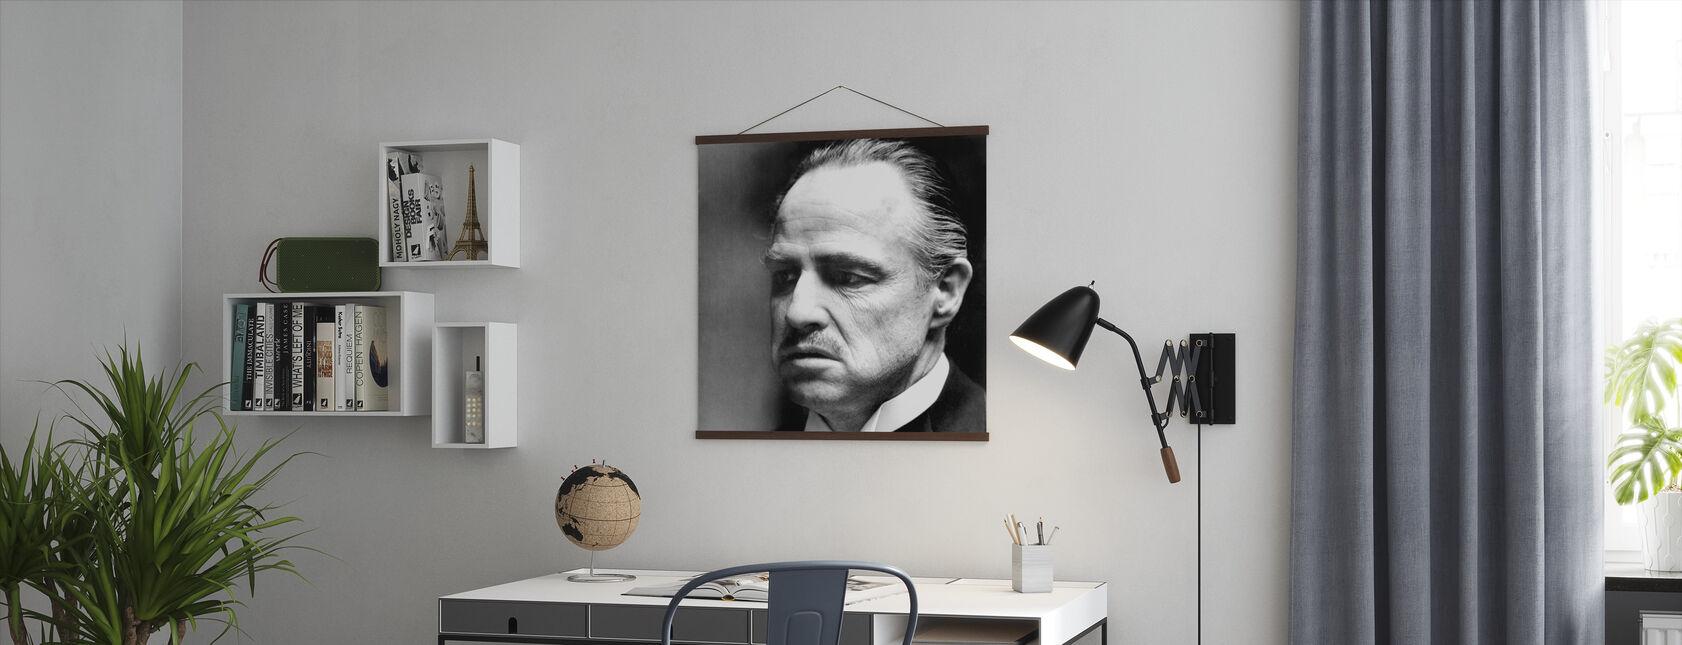 Gudfadern - Don Vito Corleone - Poster - Kontor